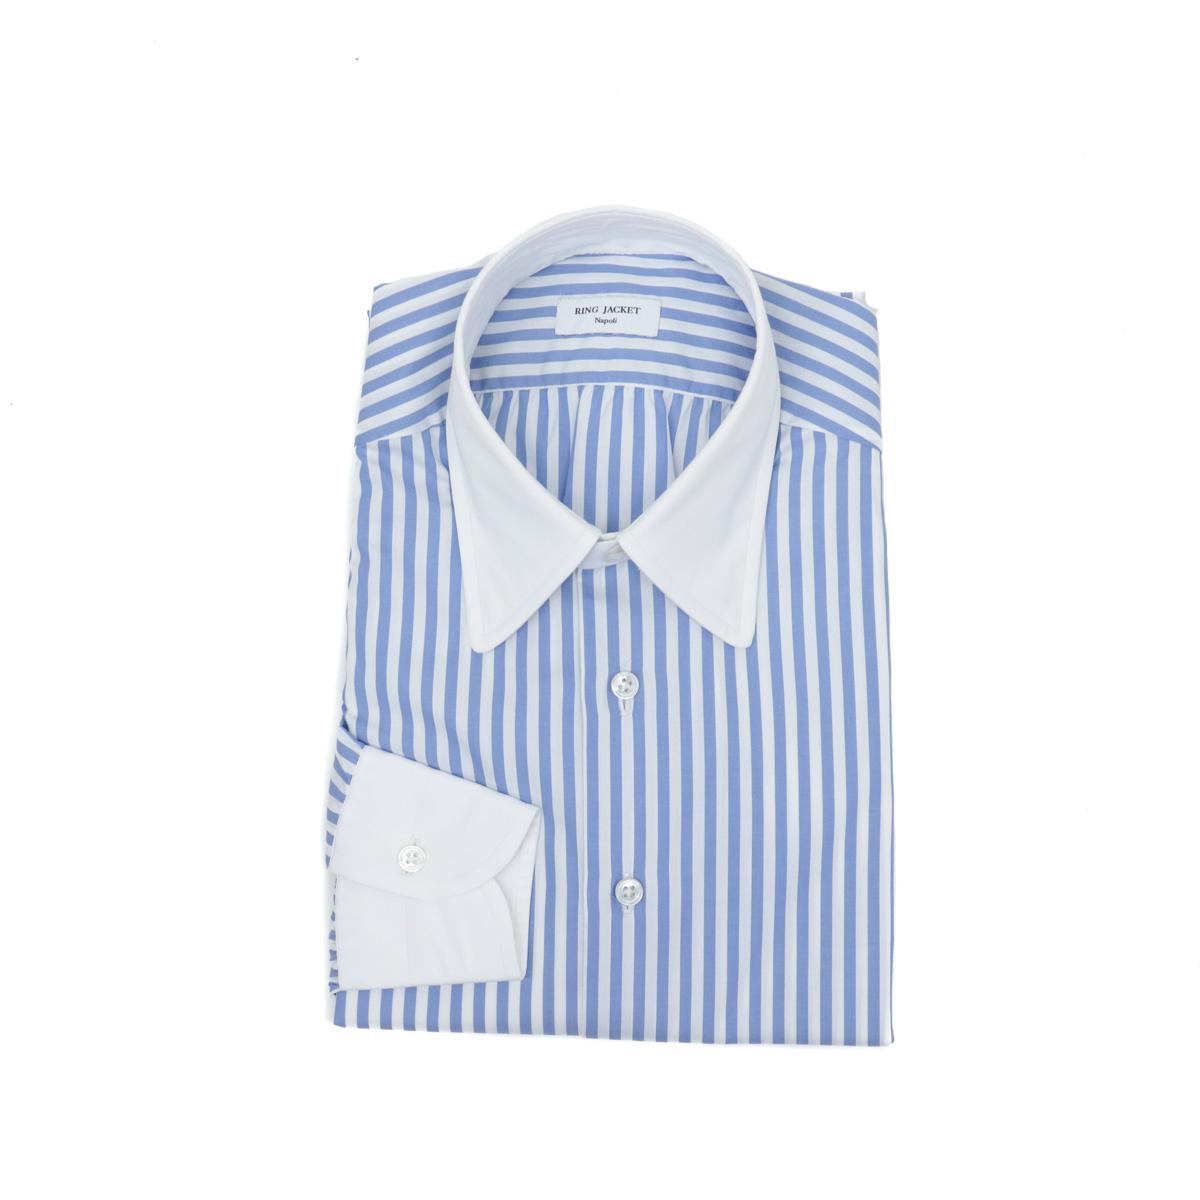 RING JACKET JACKET Napoli【リングヂャケット ナポリ ブルー】】Shirts【シャツ/】ラウンドカラー【ストライプ/ ブルー】, 教育と健康の店フォレスト:c2ee75b8 --- djcivil.org